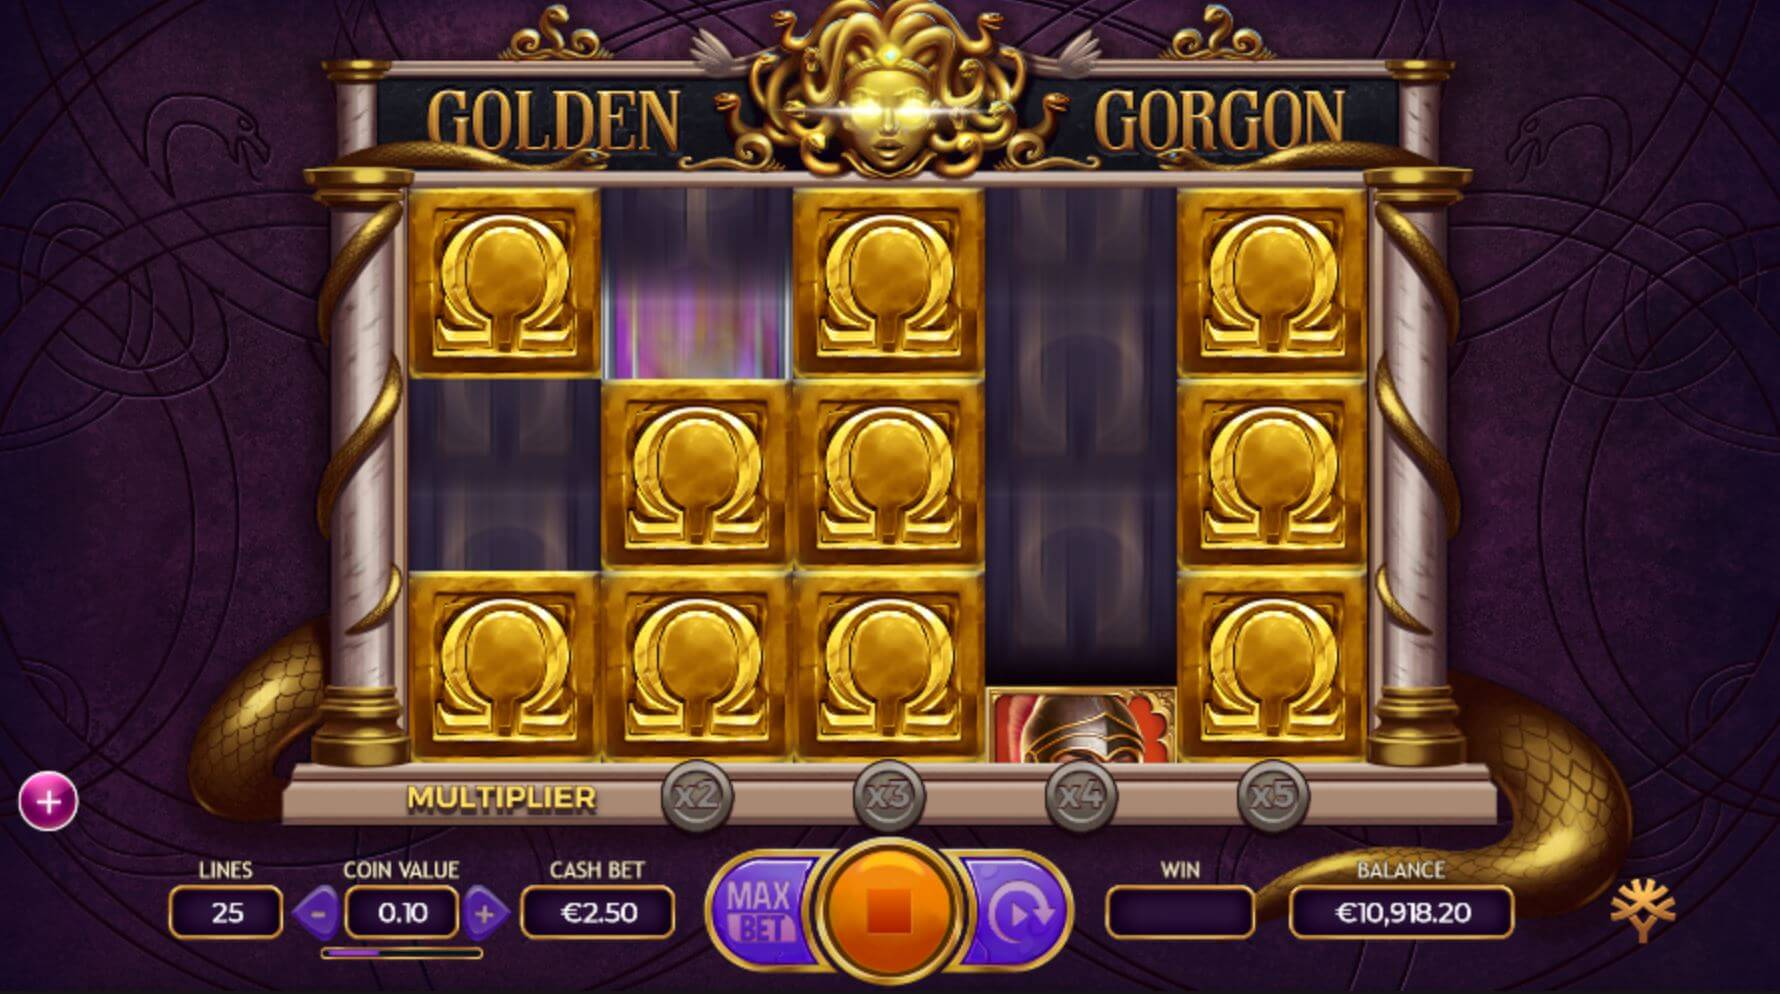 Golden Gorgon Golden symbols